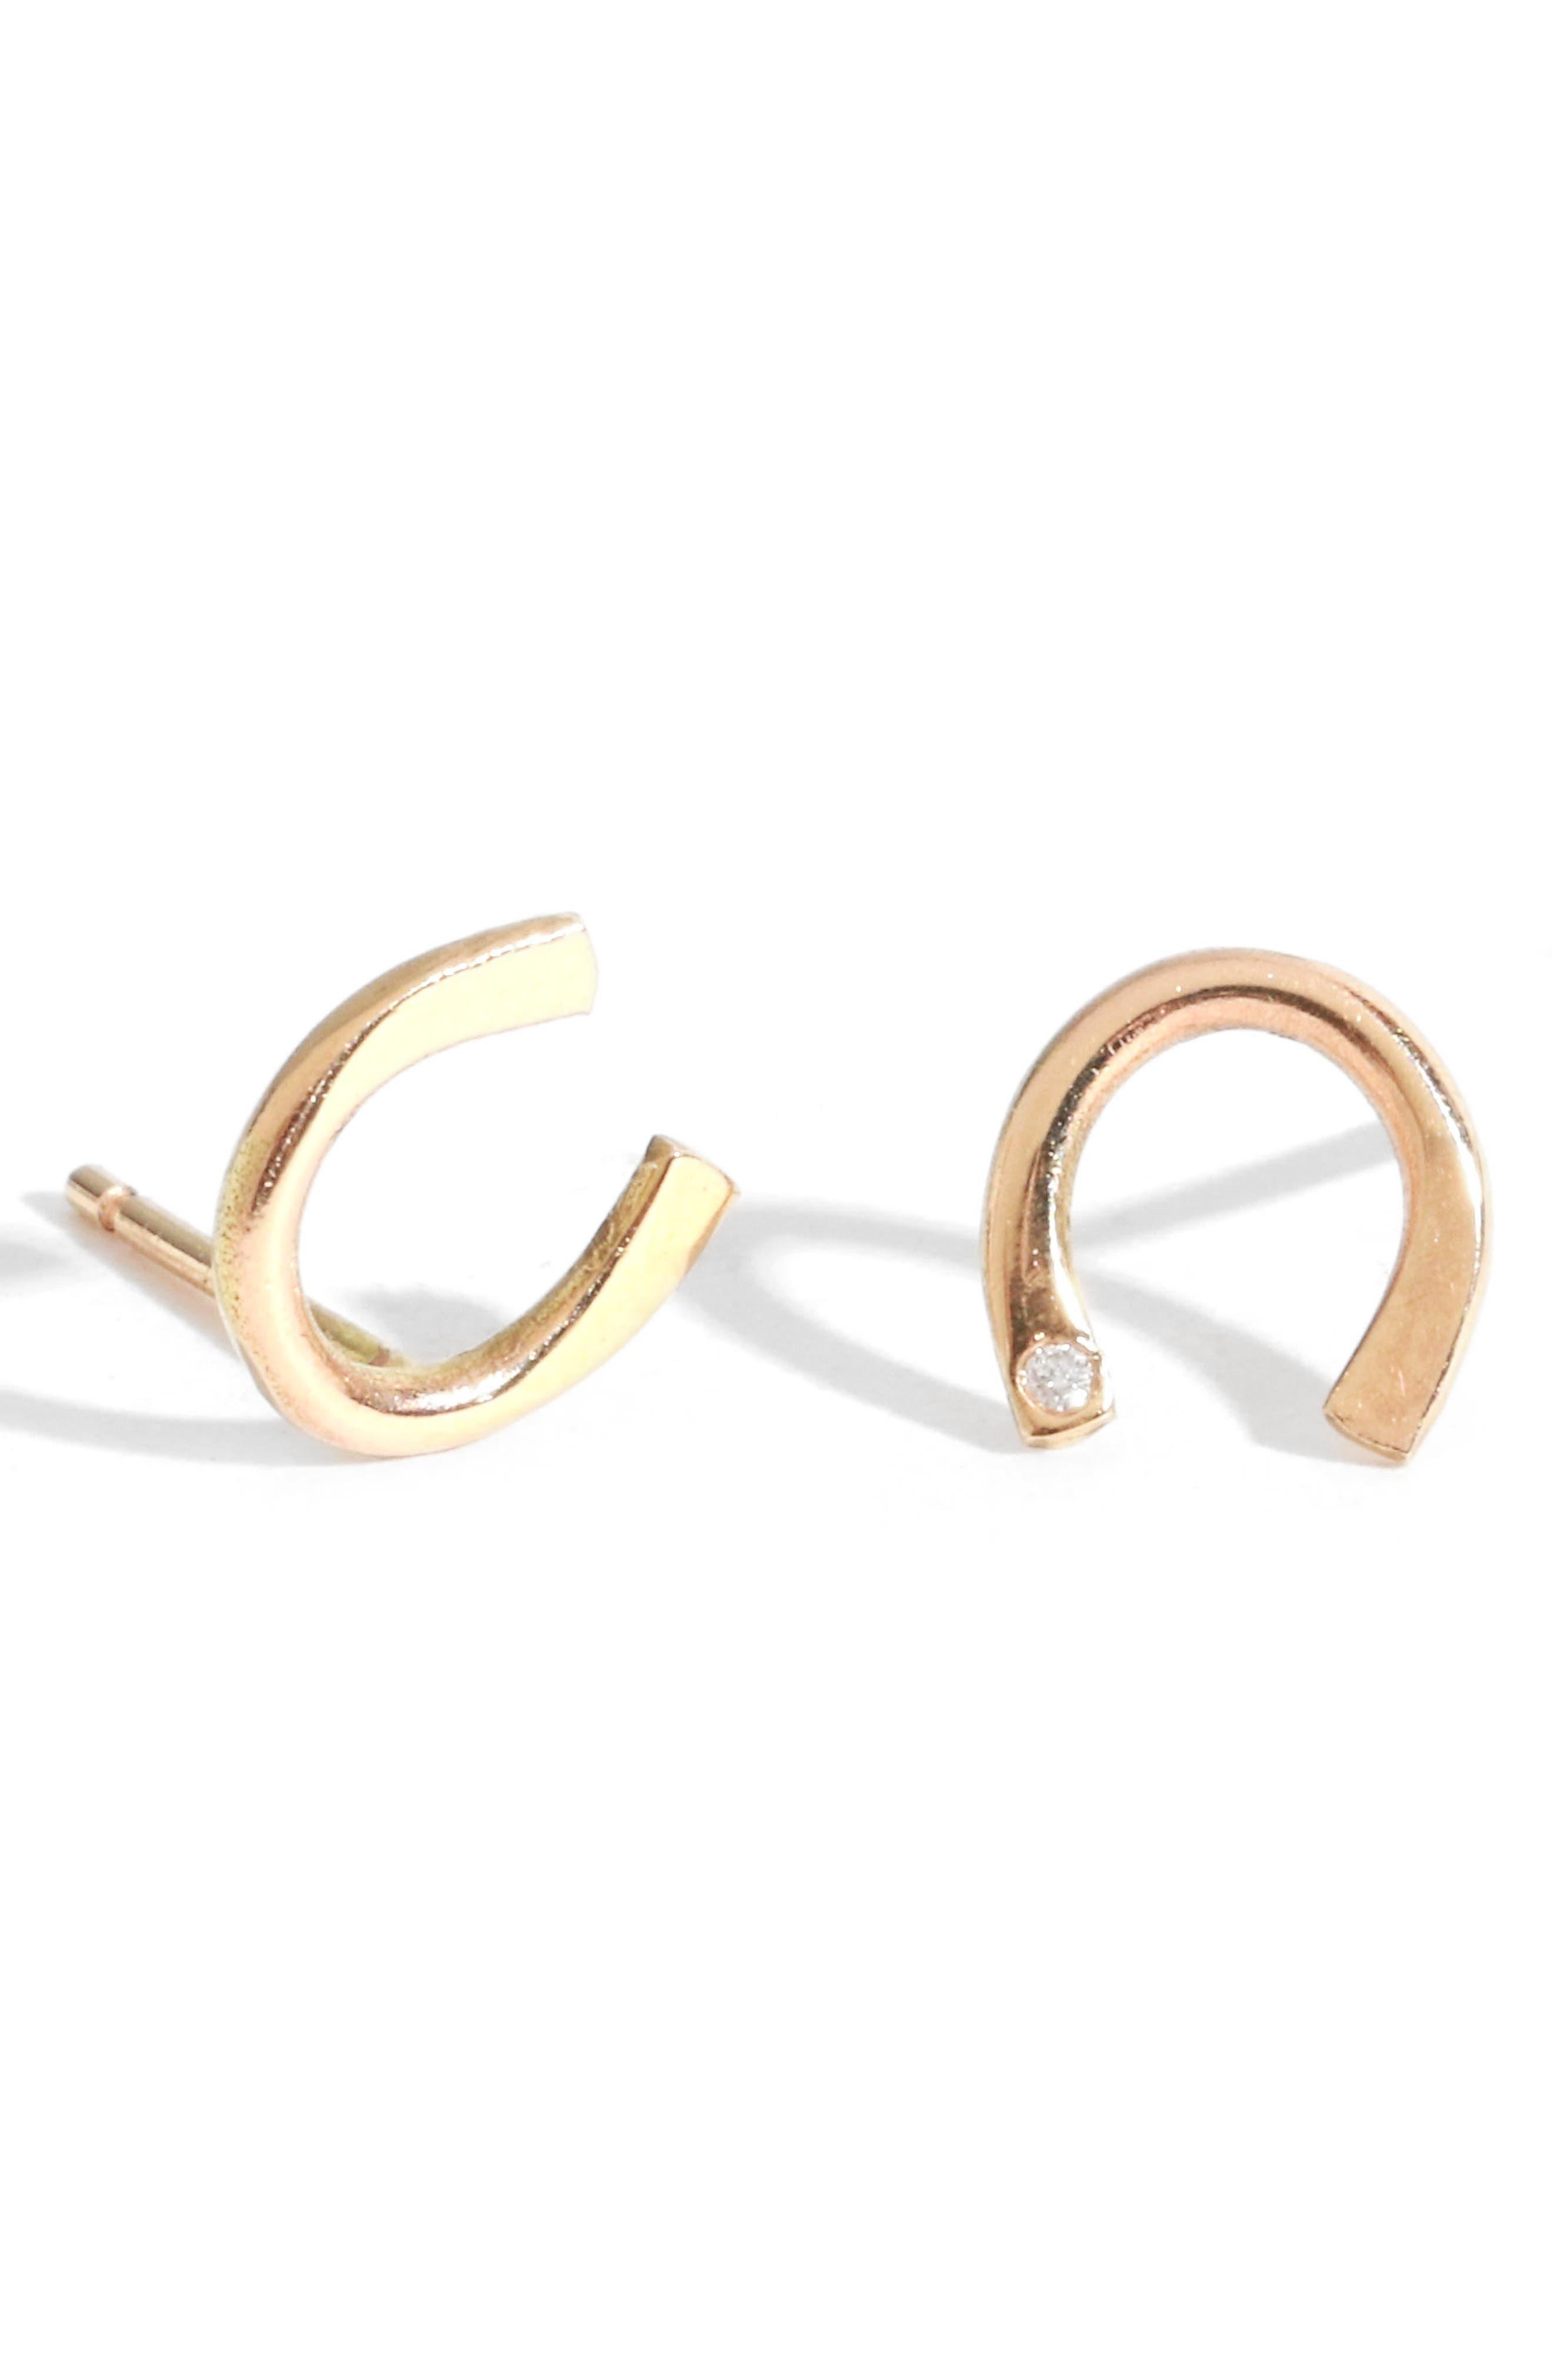 Diamond Horseshoe Stud Earrings,                             Main thumbnail 1, color,                             Yellow Gold